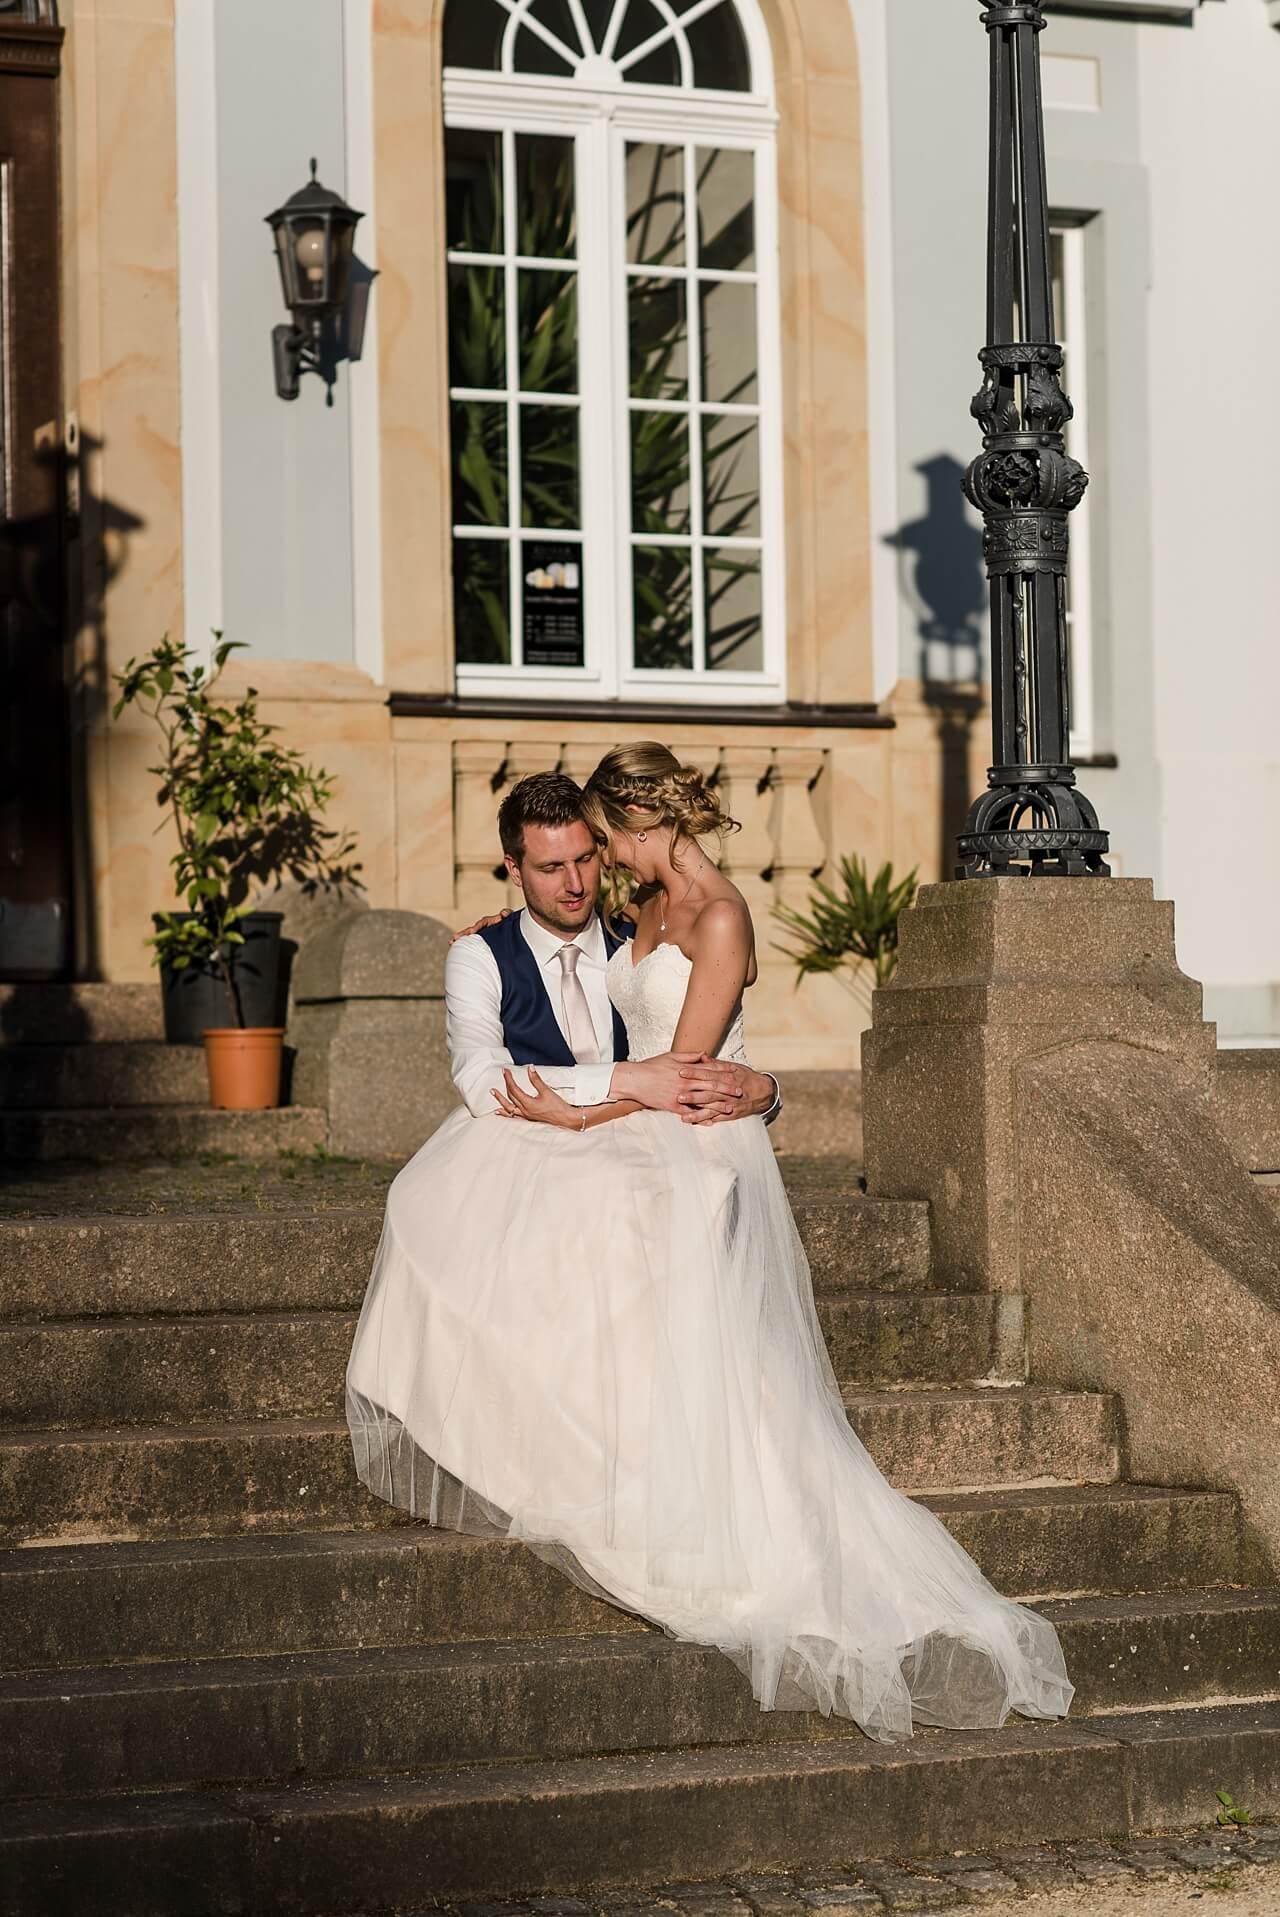 Rebecca Conte Fotografie: Heiraten in Leipzig 42